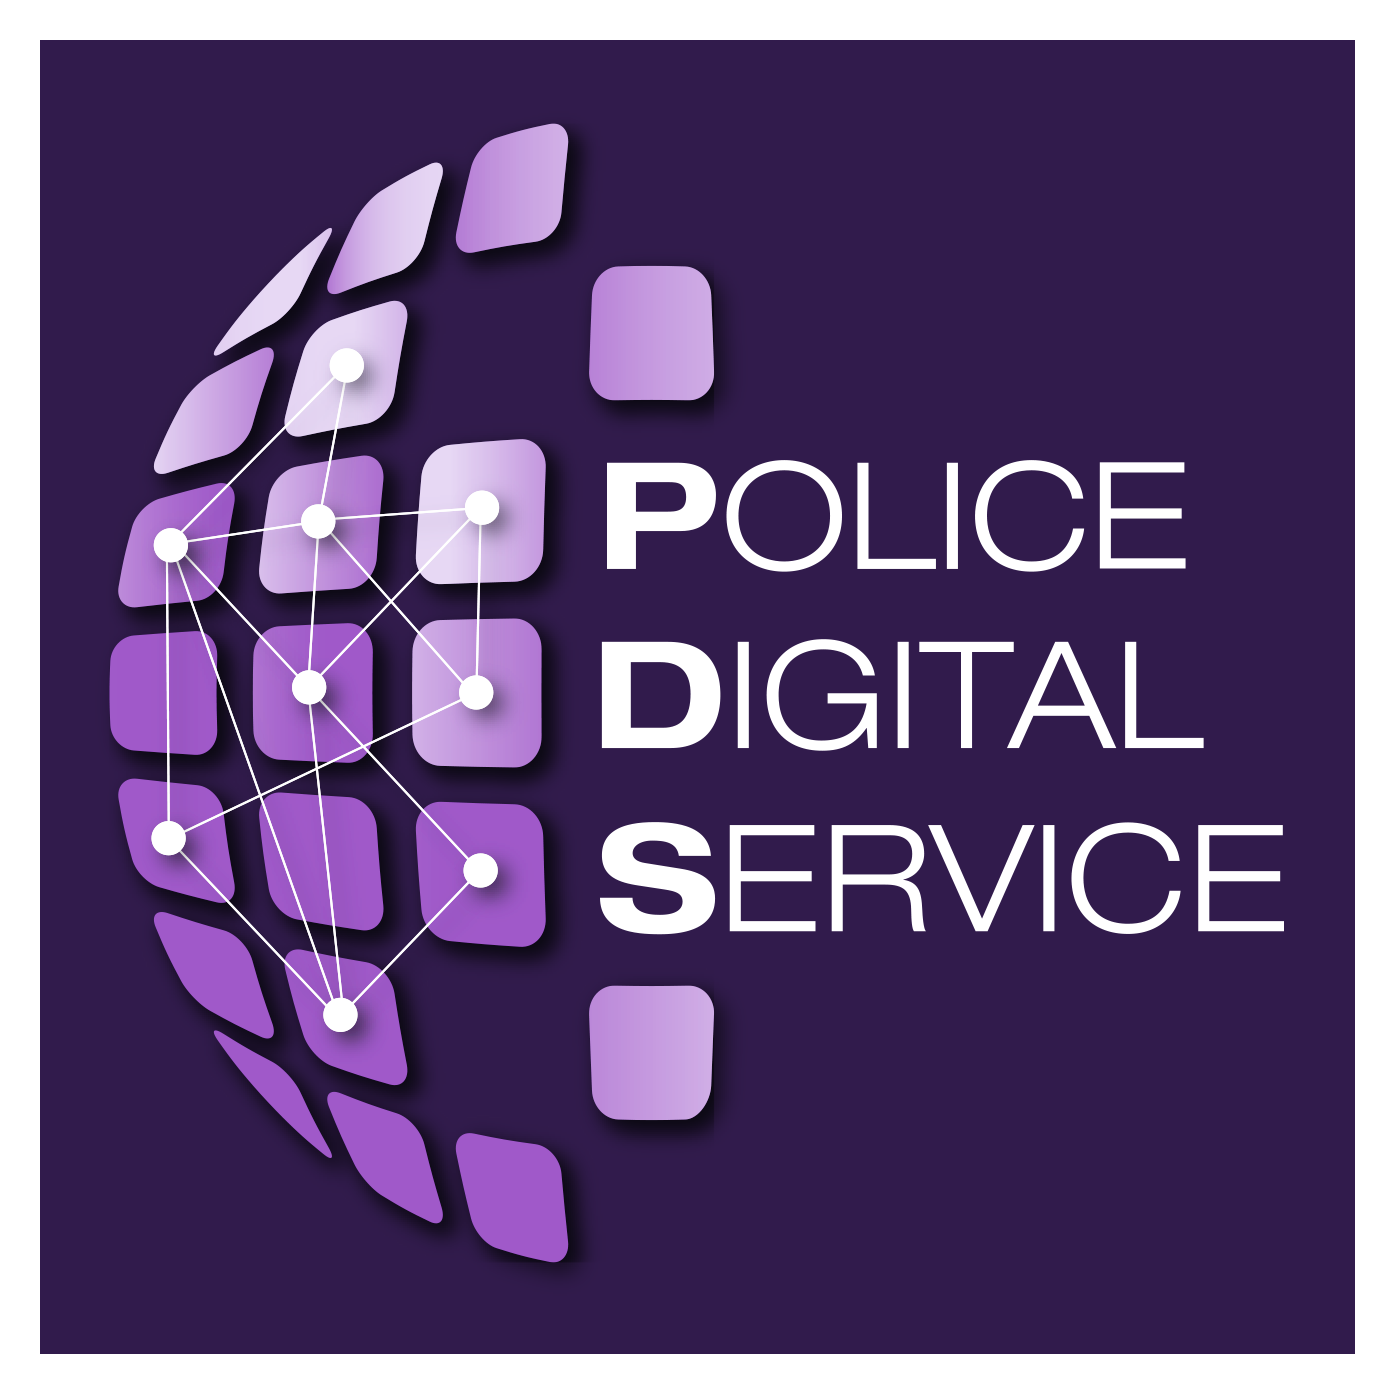 Police Digital Service